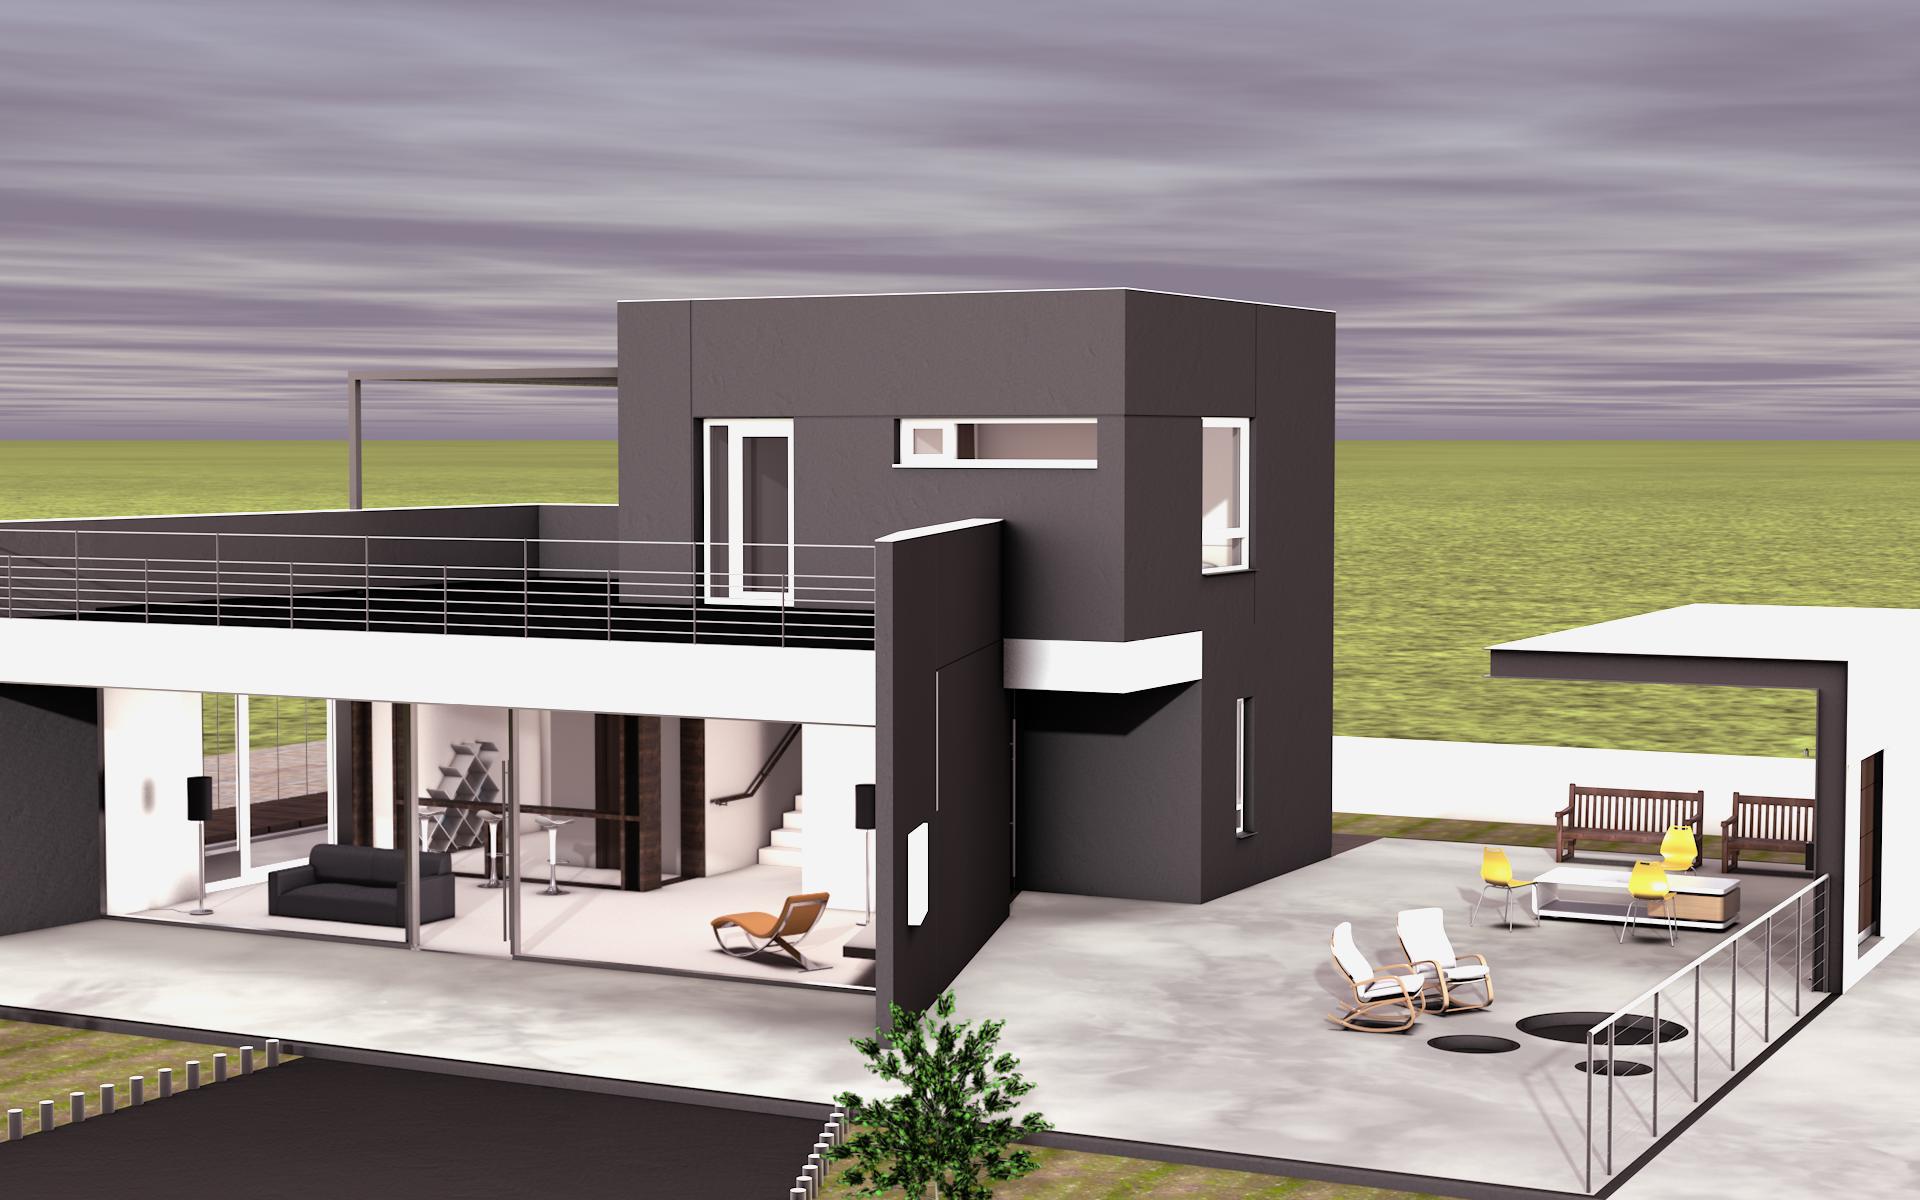 modern house residential exterior 3d render